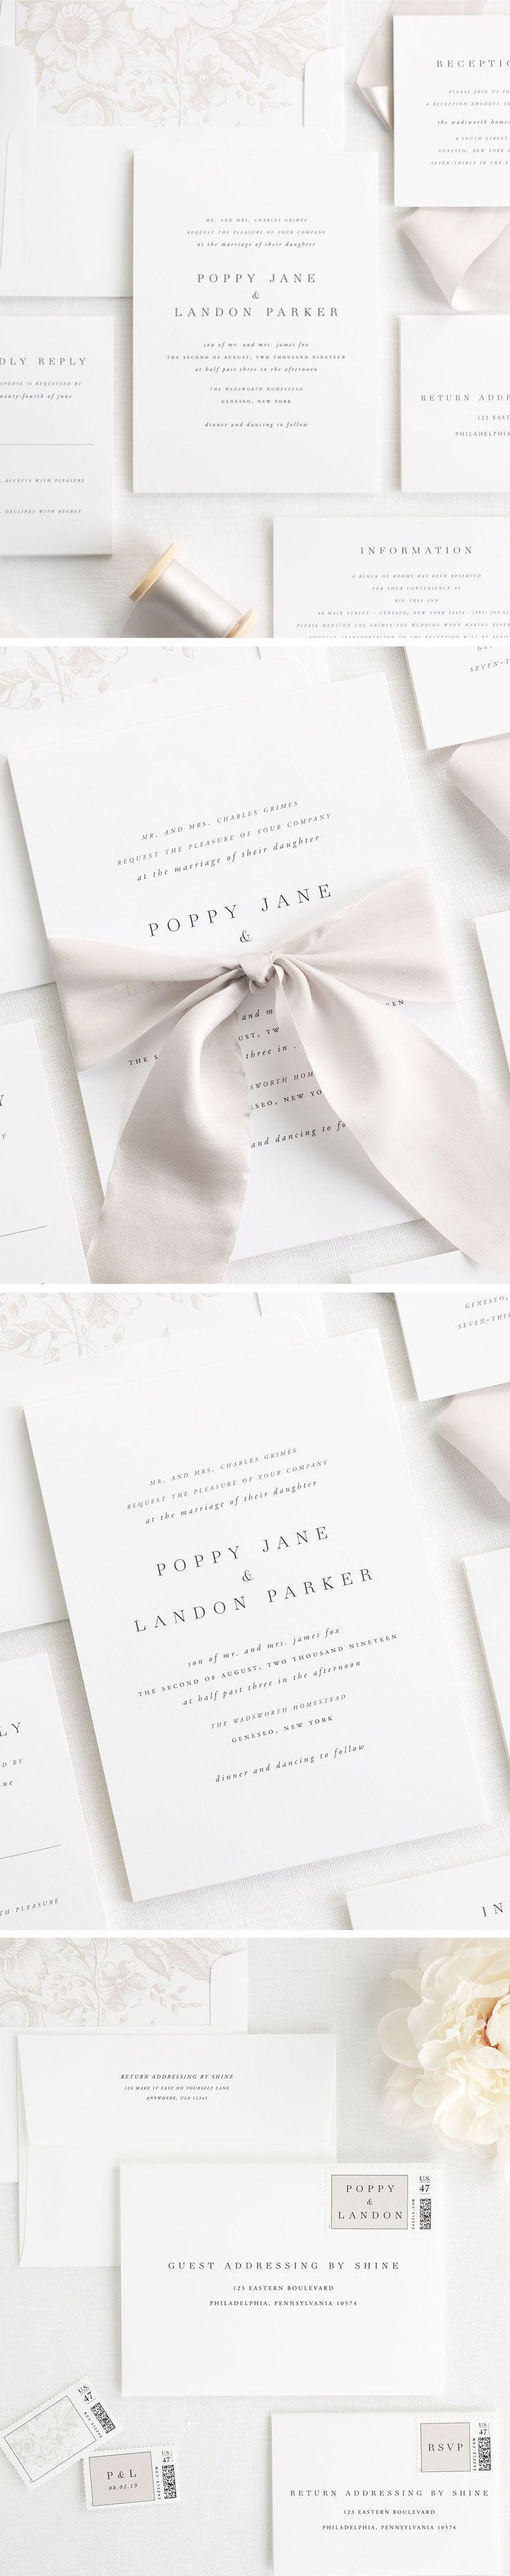 25 best Wedding Invitations images on Pinterest | Wedding stationery ...